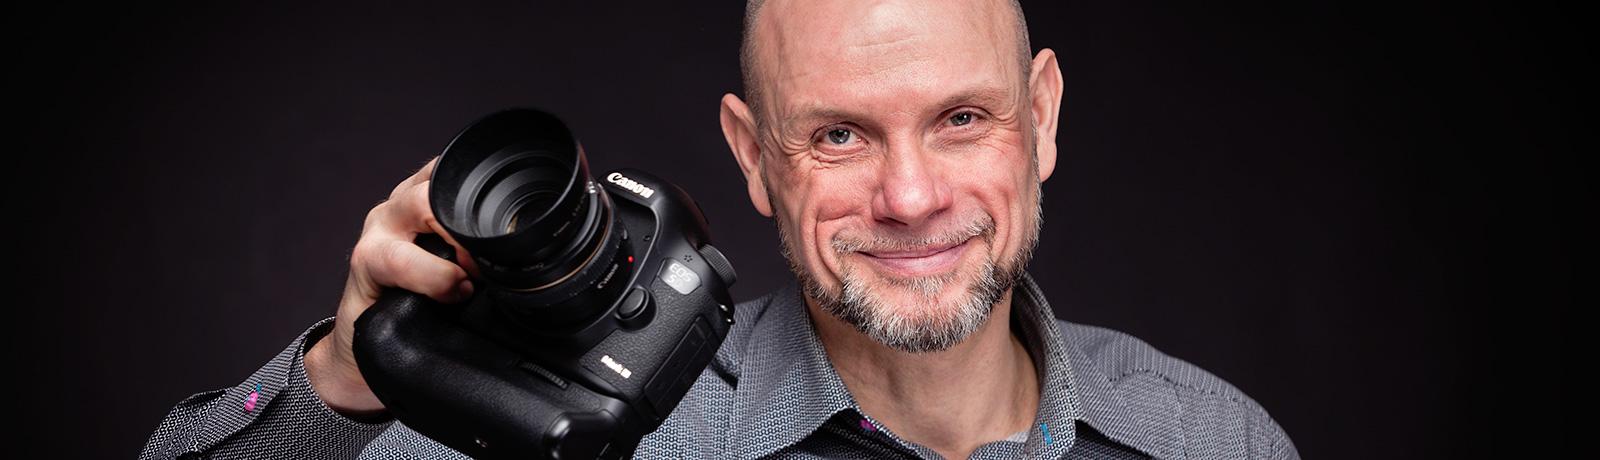 Christian Schroth Fotografie